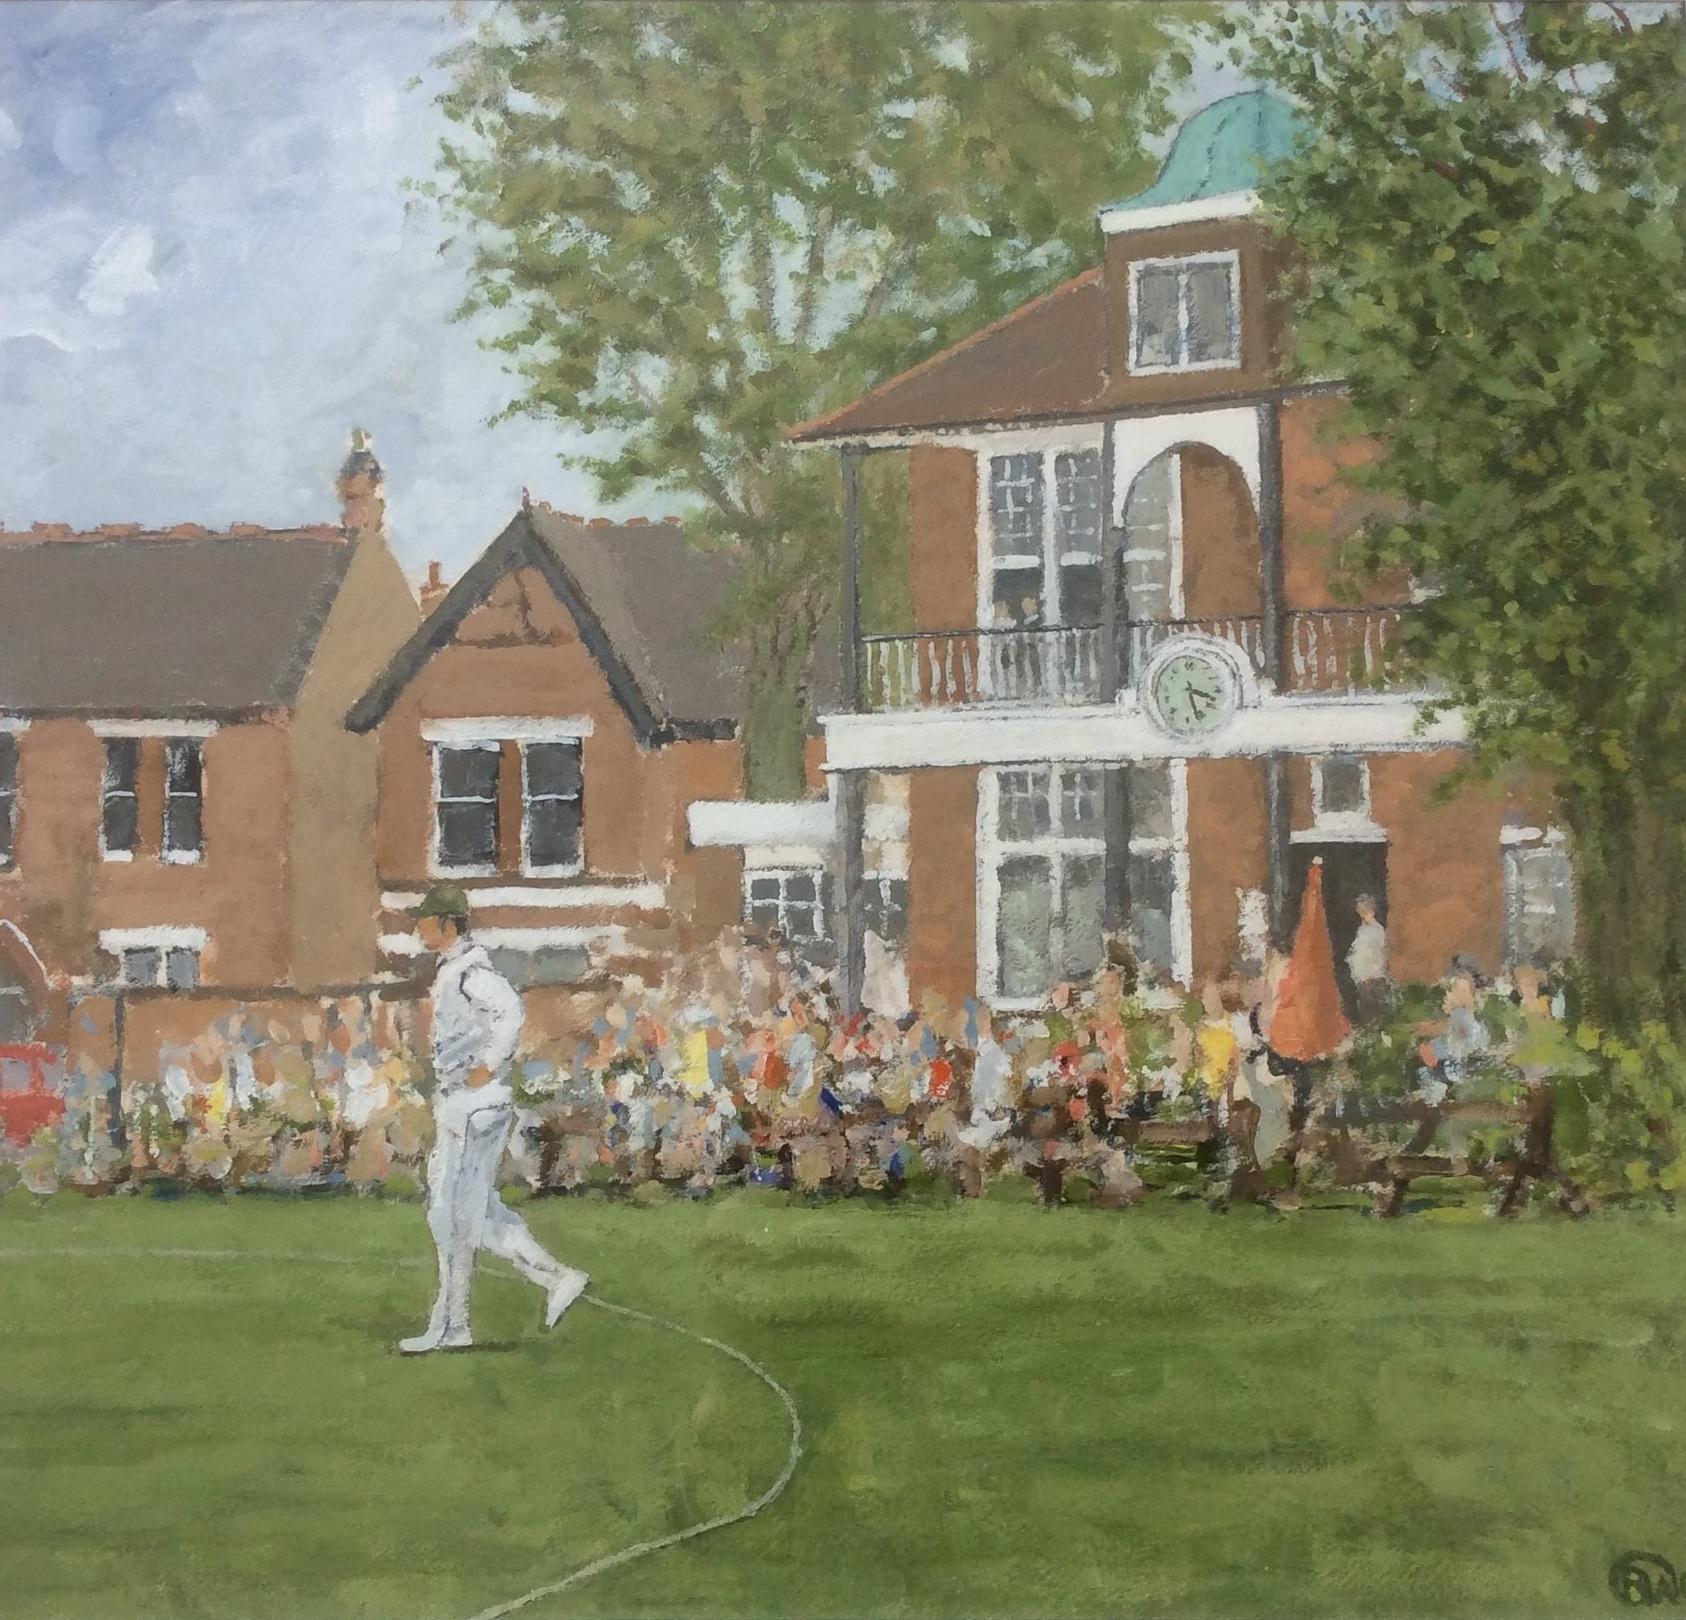 The Fielder, Ealing Cricket Club